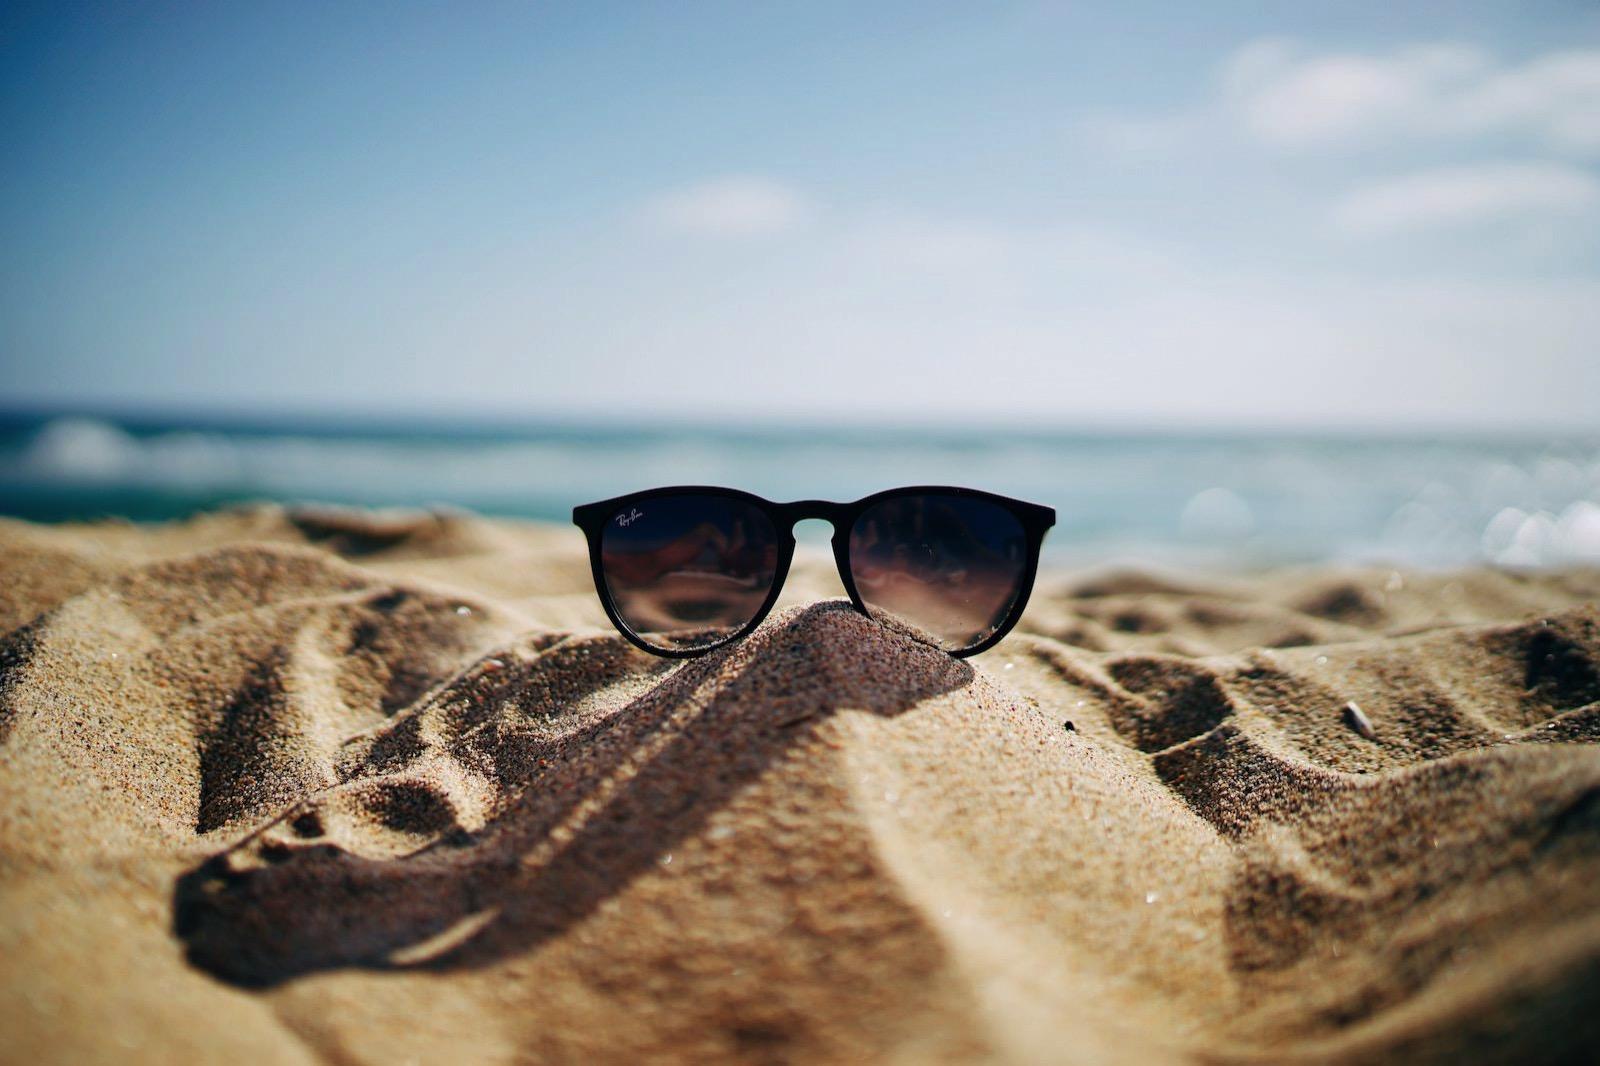 Ethan robertson 134952 unsplash summer and sunglasses